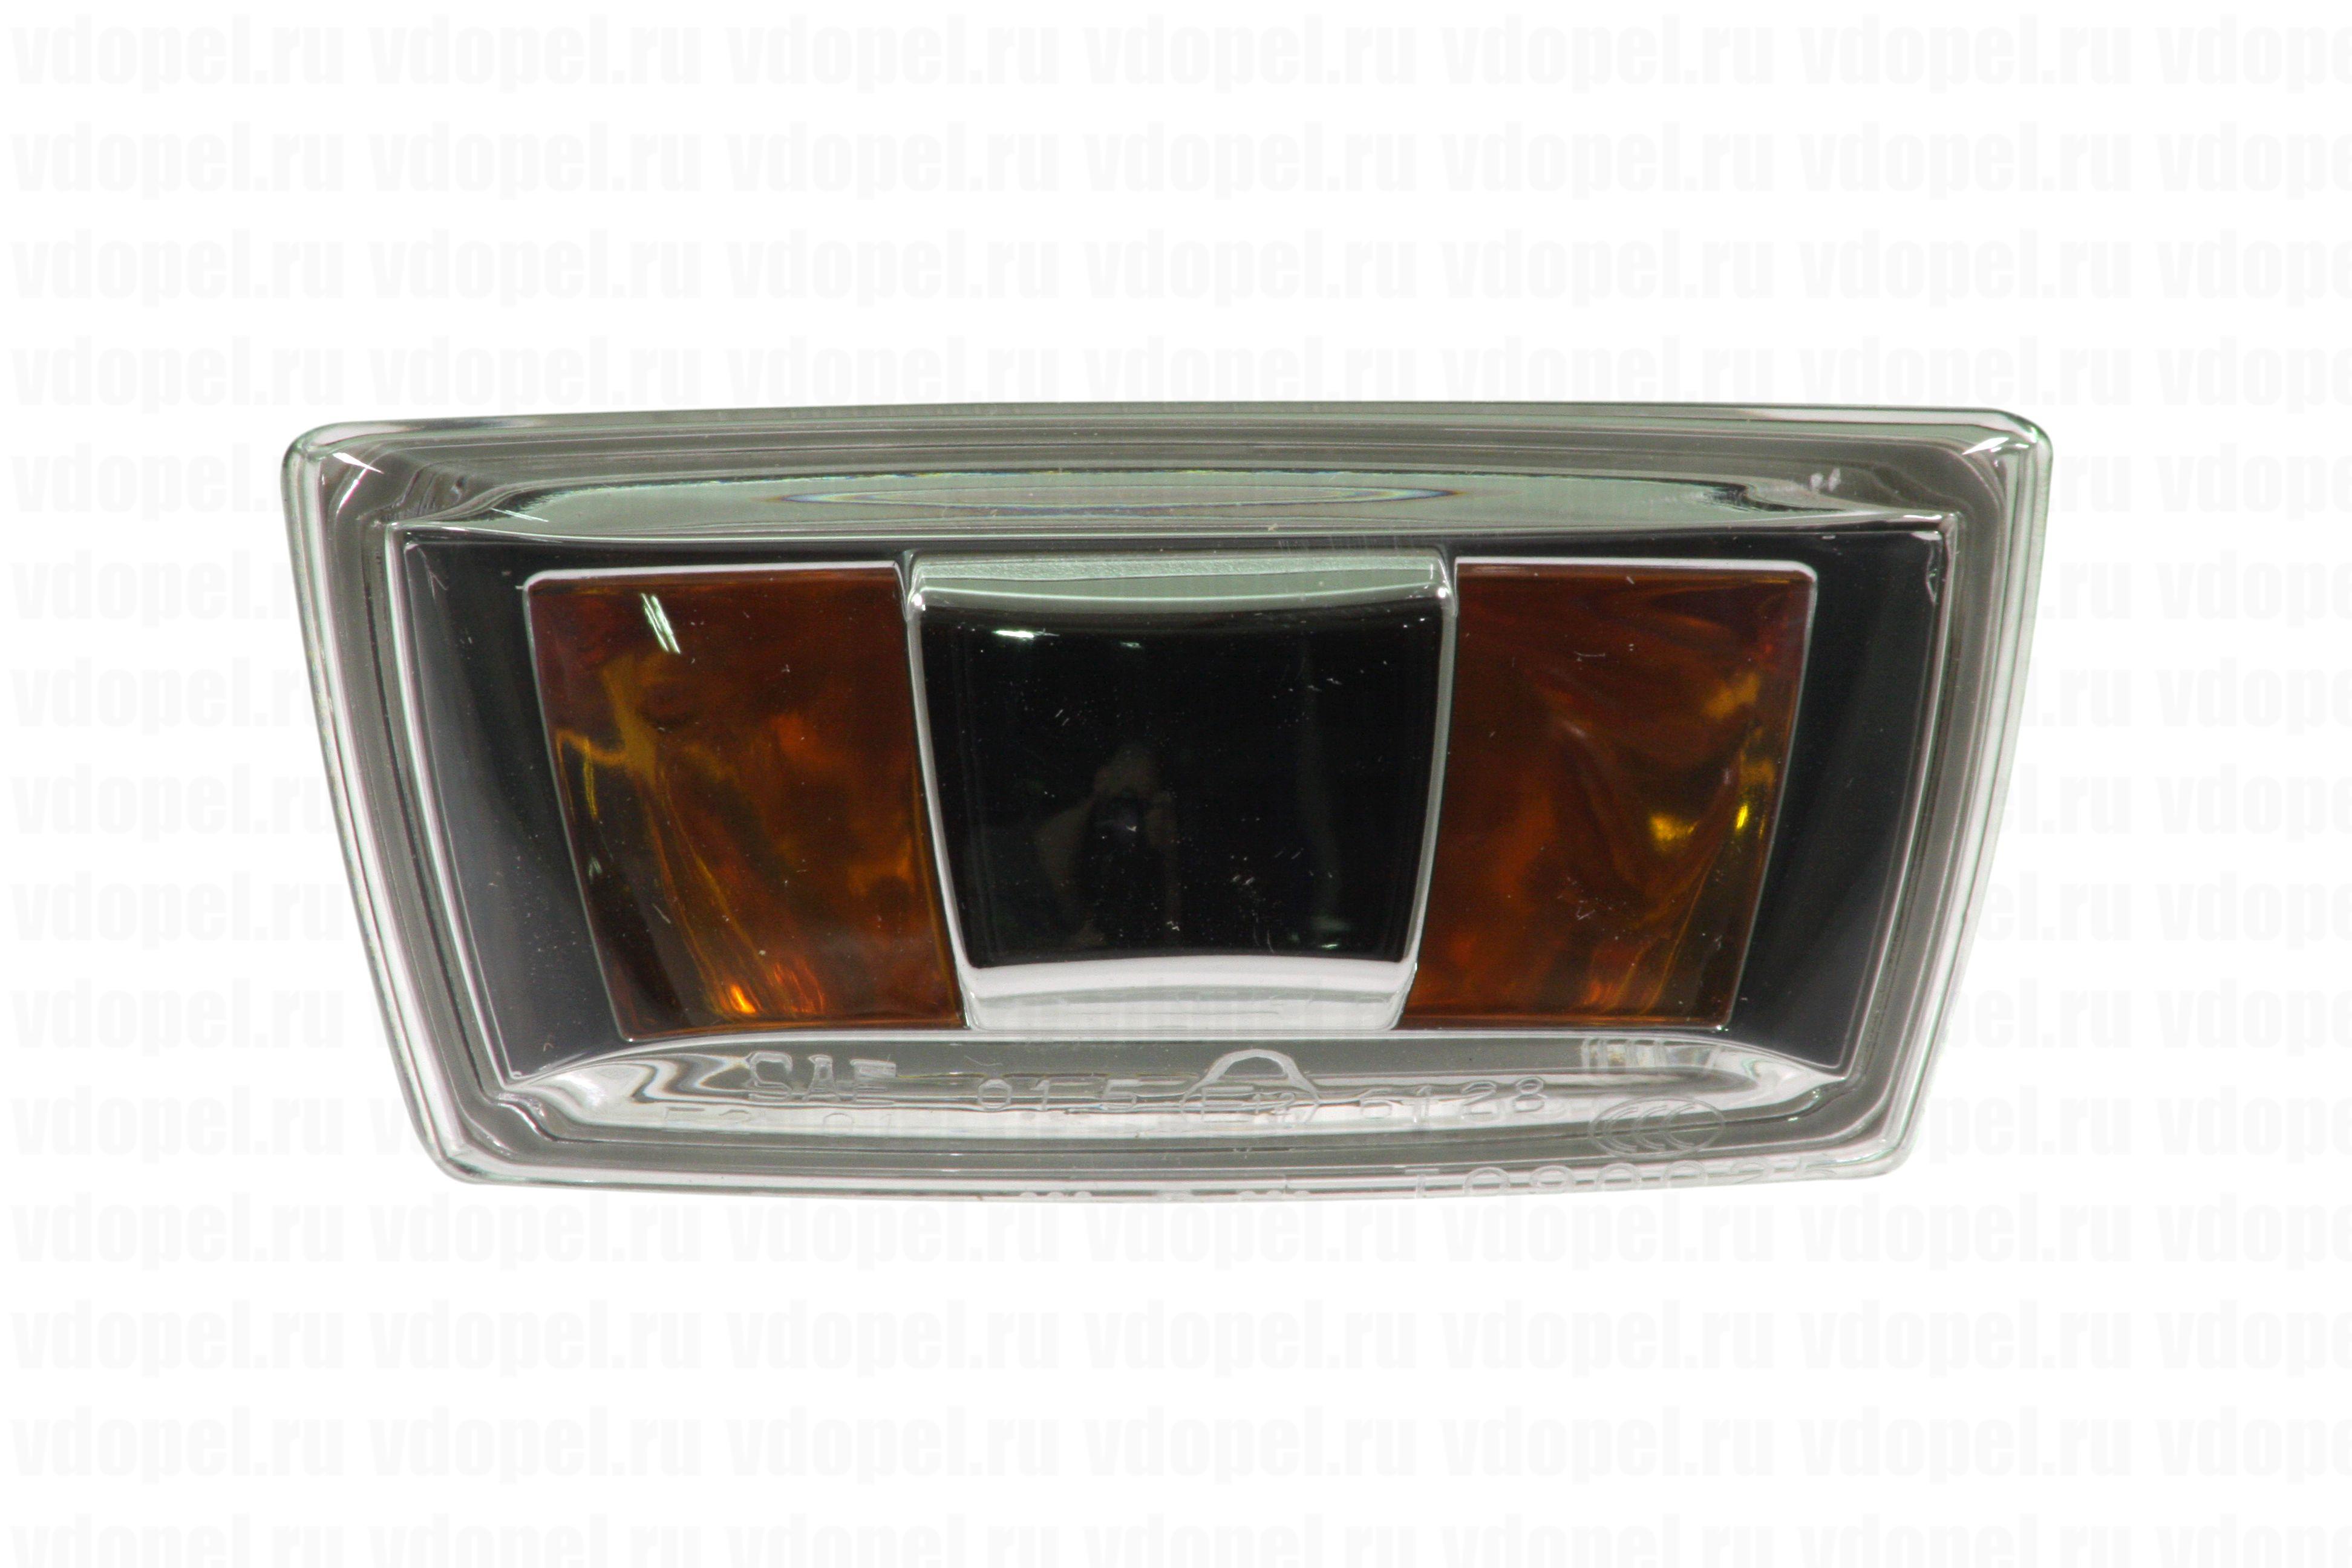 GM 13497990  - Повторитель поворота боковой. Астра HJ, Зафира В, Корса D, Инсигния прав. Chevrolet